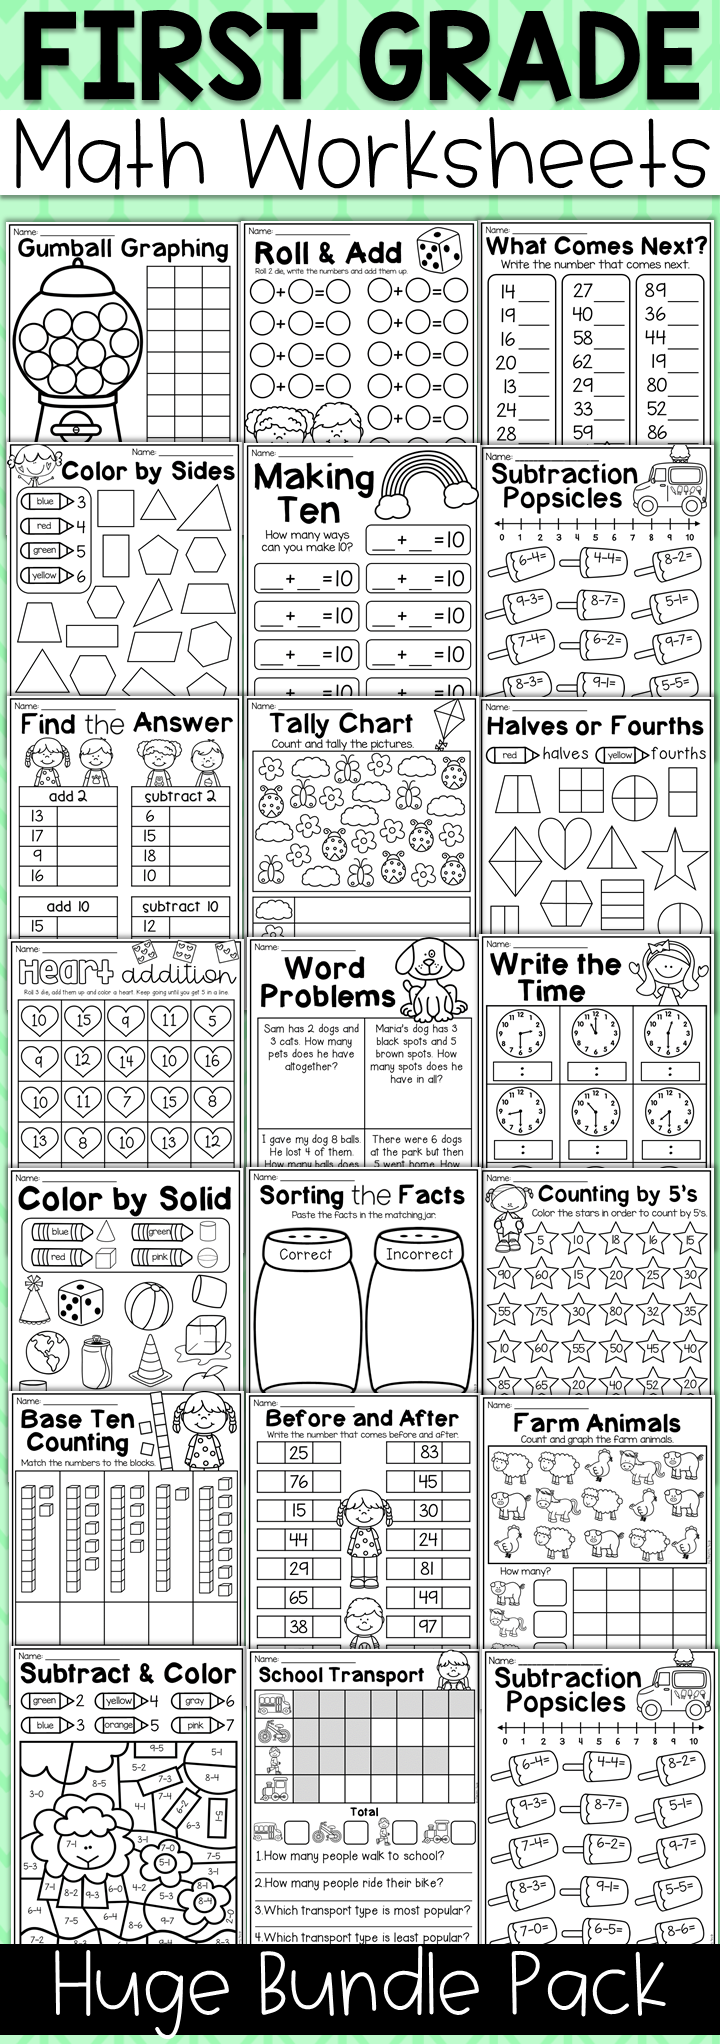 First Grade Math Worksheet Bundle Addition Shapes Place Value More First Grade Math Worksheets First Grade Math Worksheet [ 2044 x 720 Pixel ]